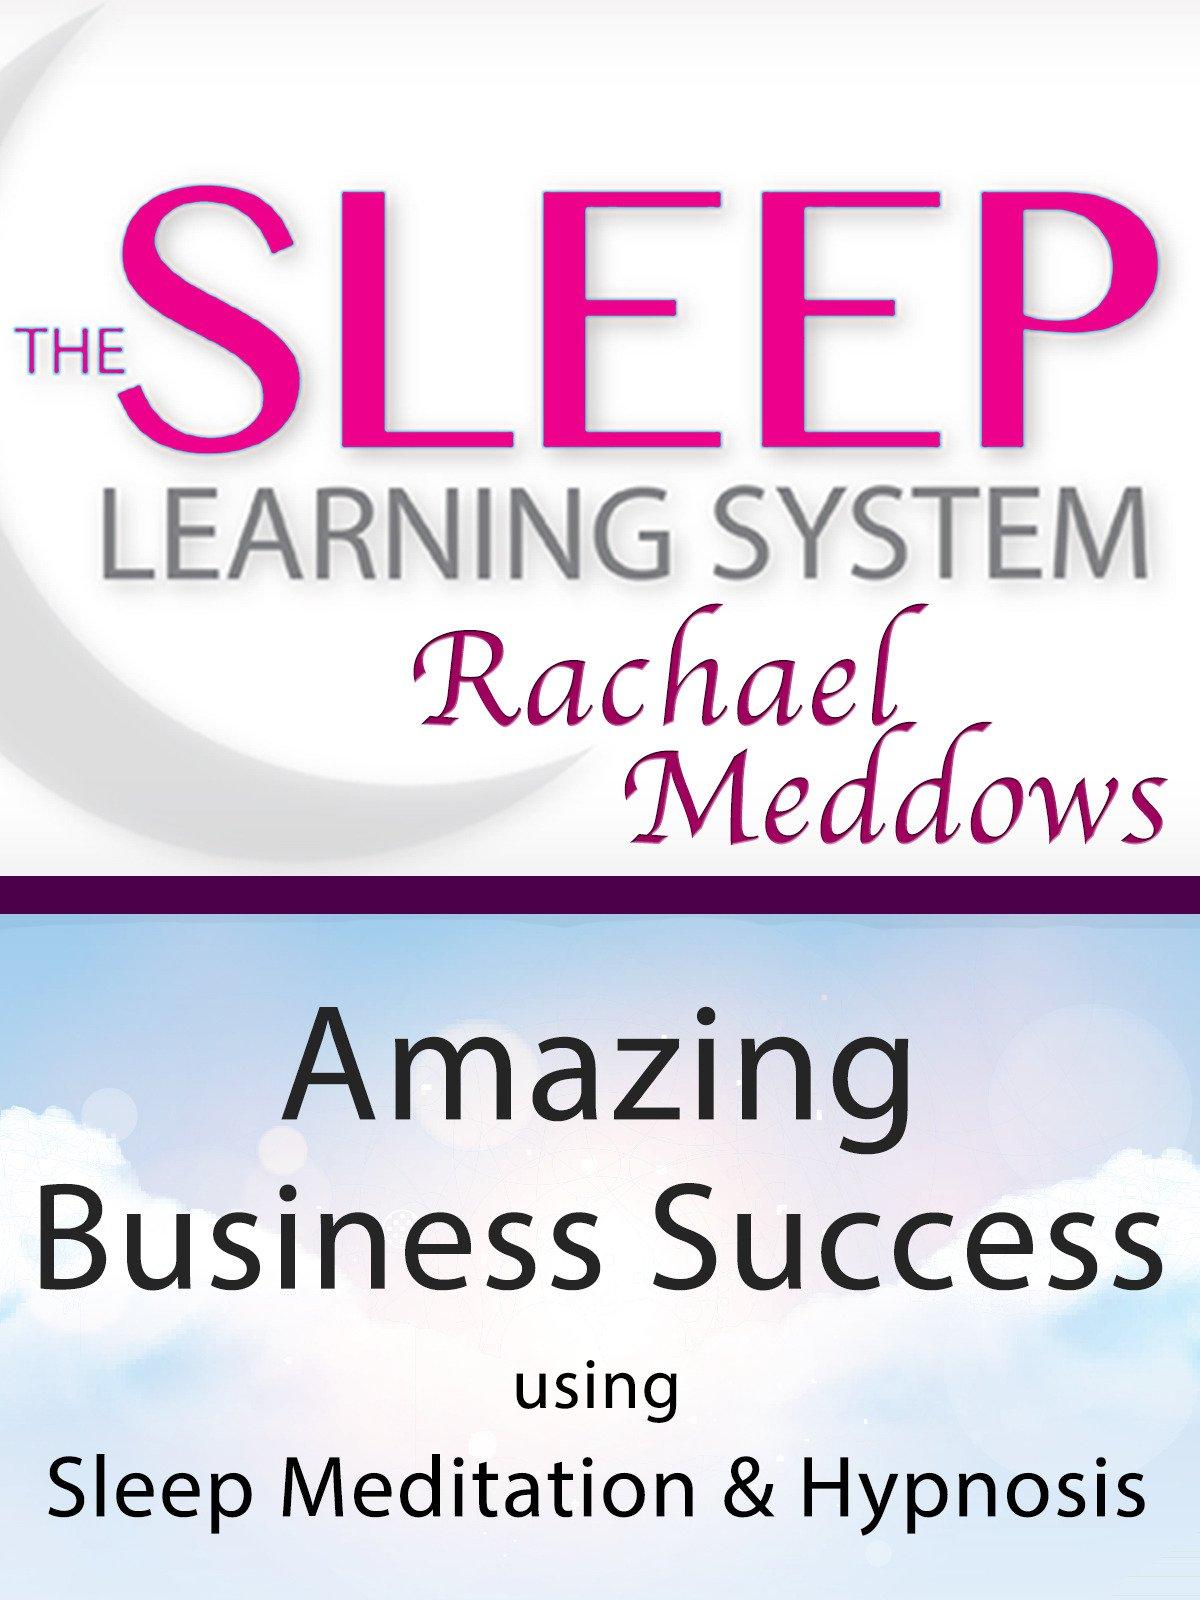 Amazing Business Success using Sleep Meditation & Hypnosis